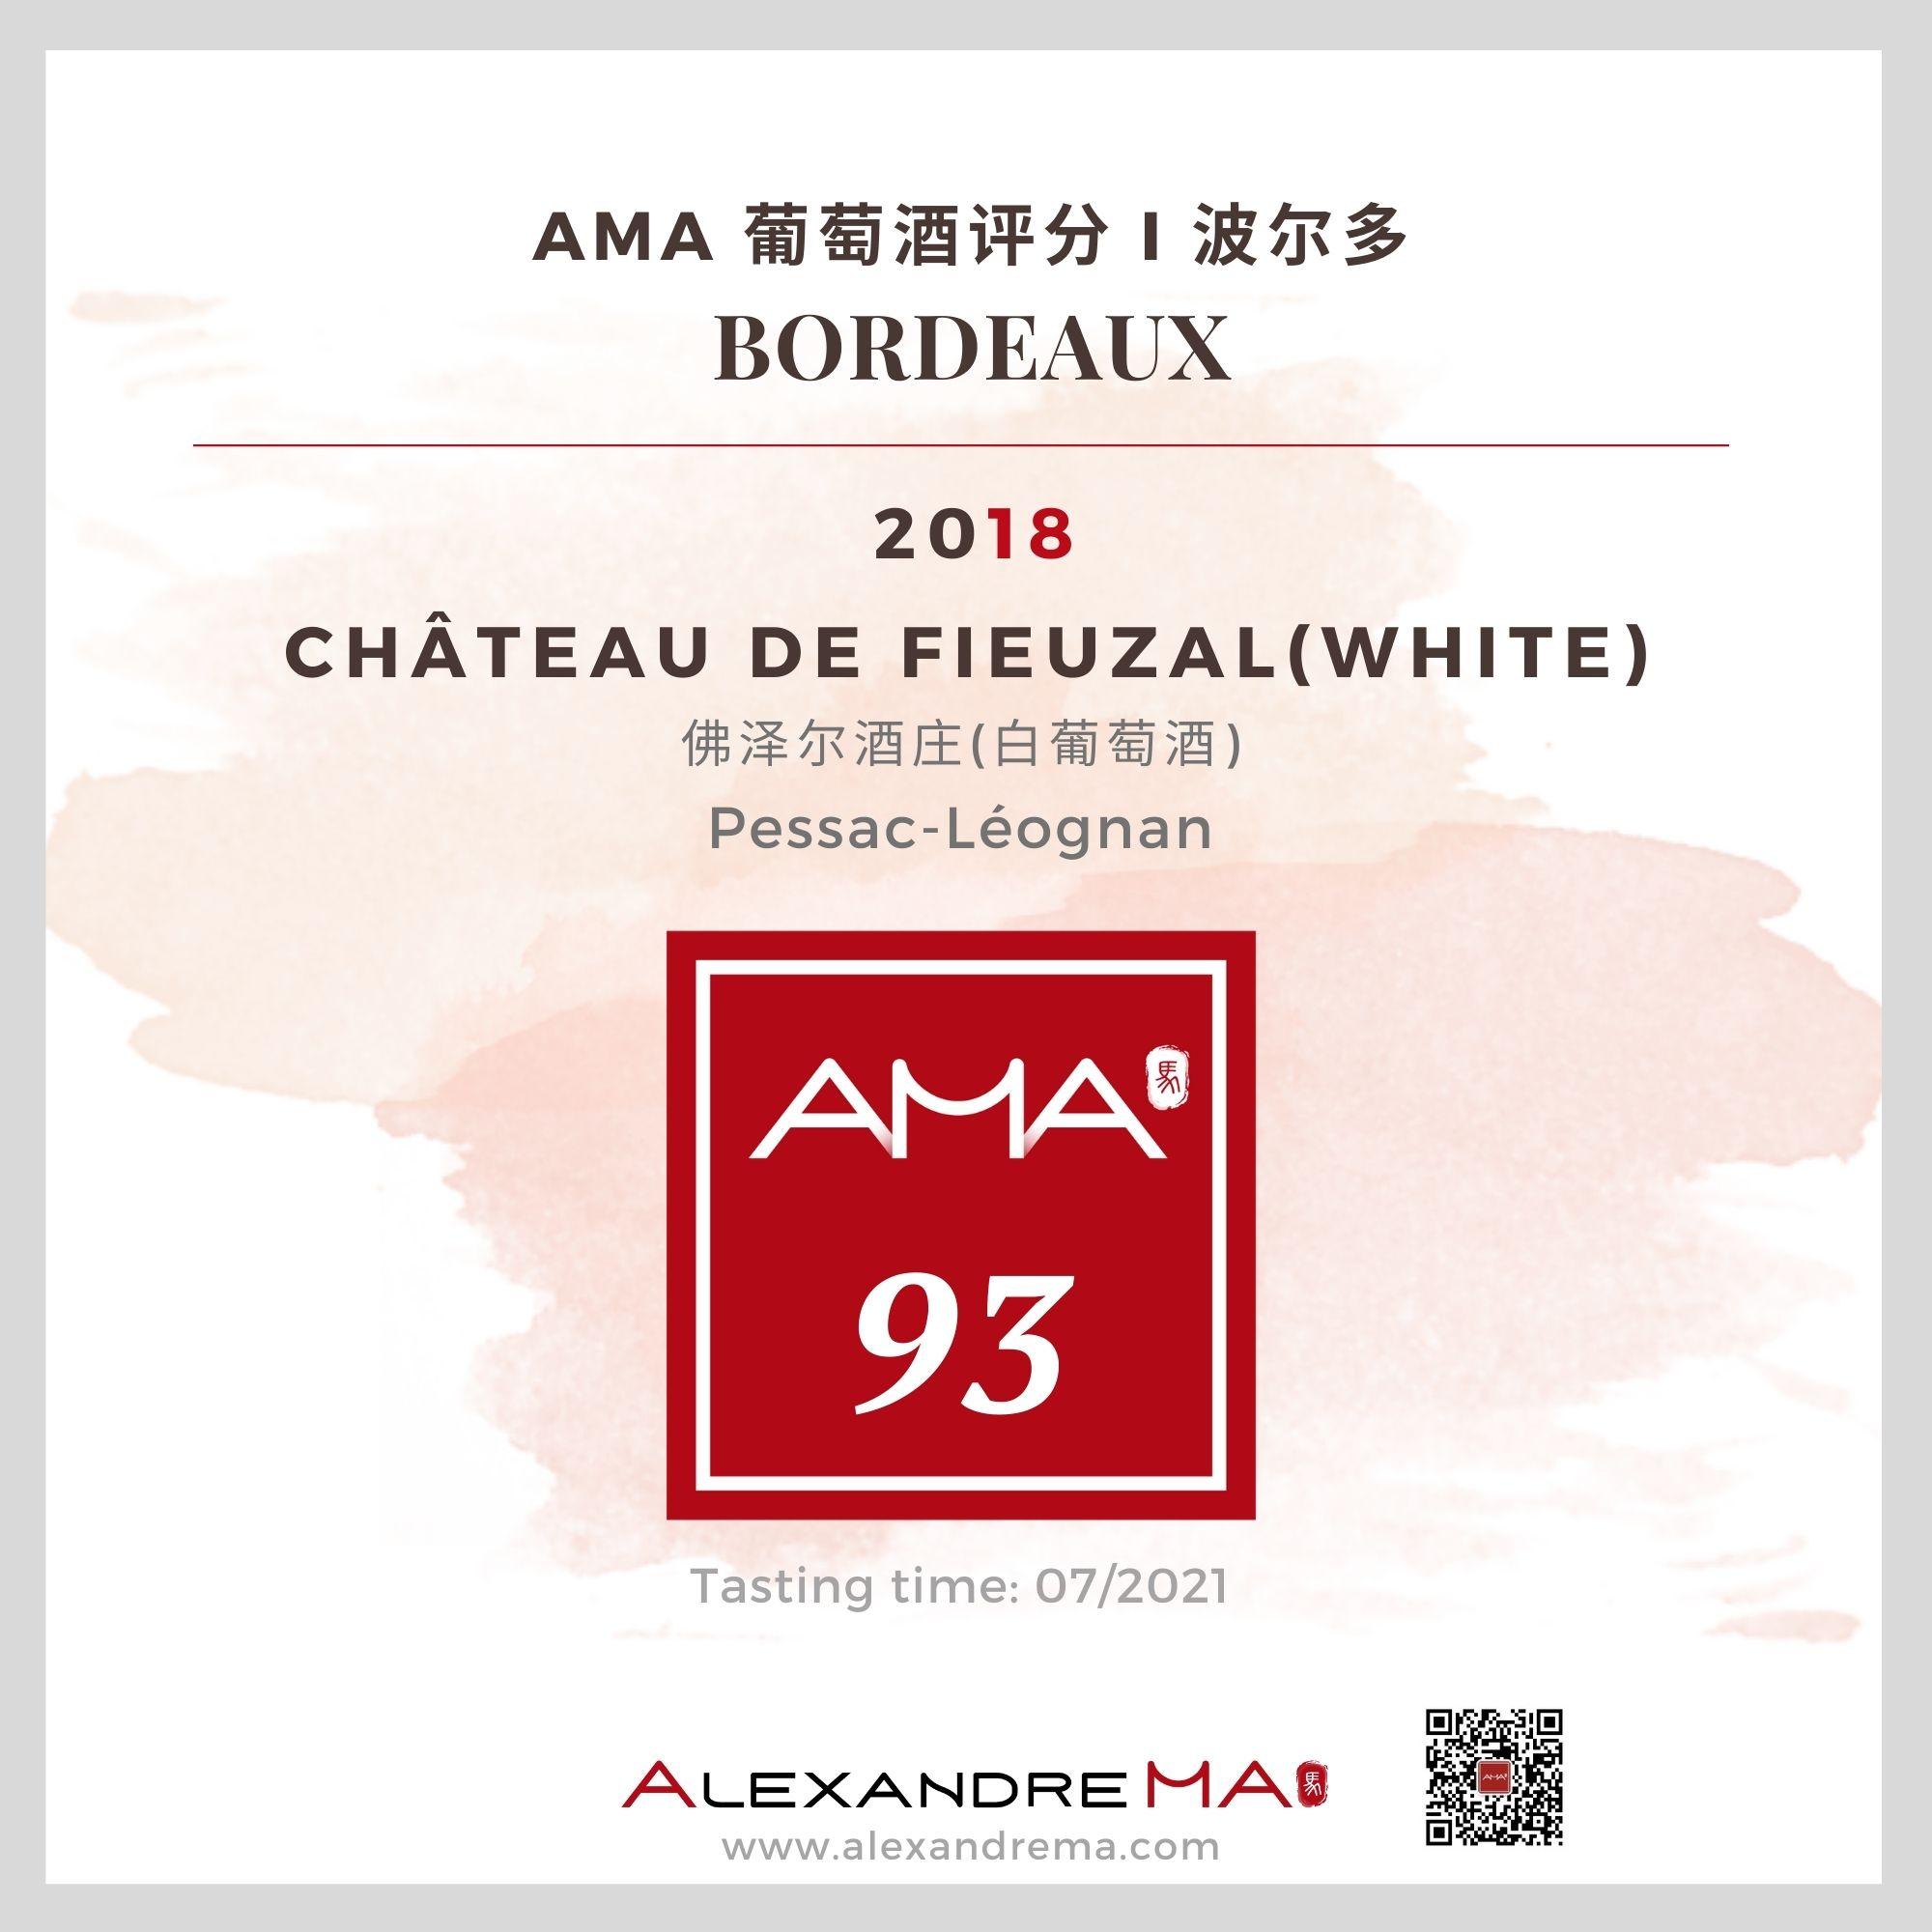 Château de Fieuzal White 2018 - Alexandre MA